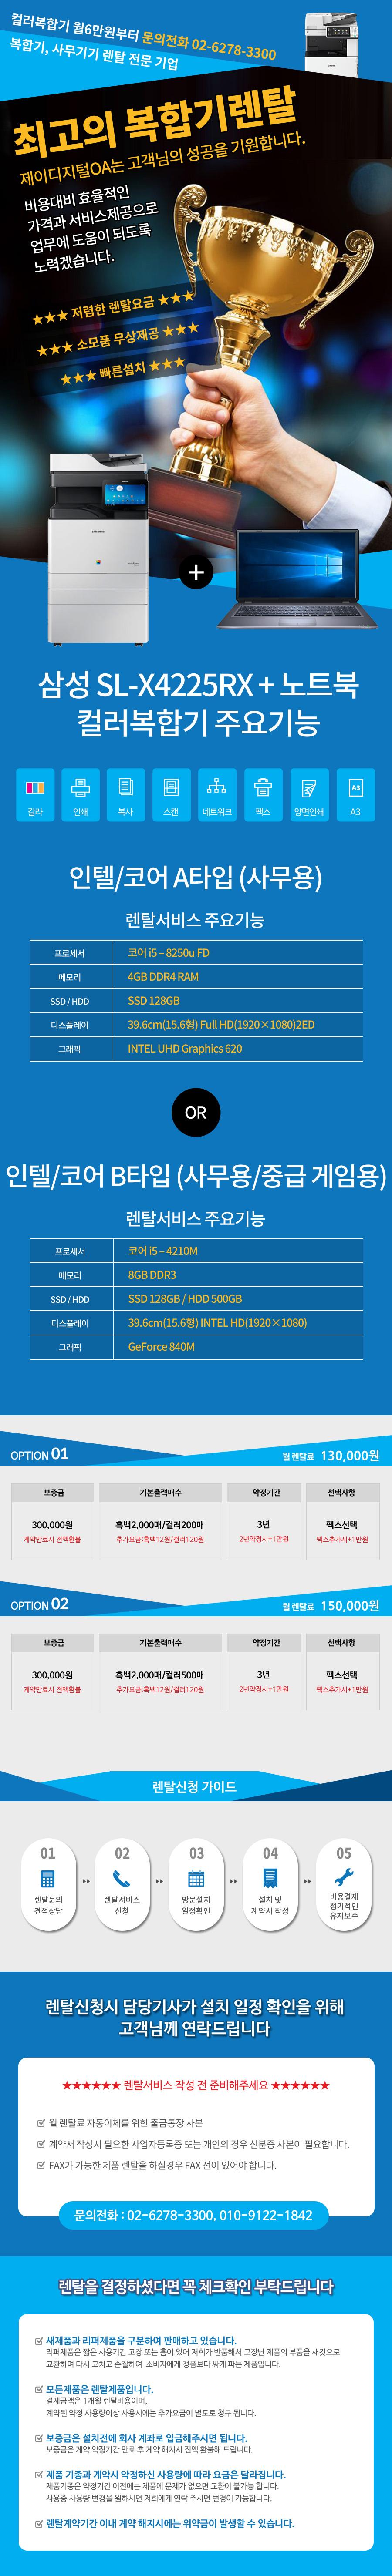 bef9e6dc4e497655f2a08eb349afdbf6_1568775765_7726.jpg